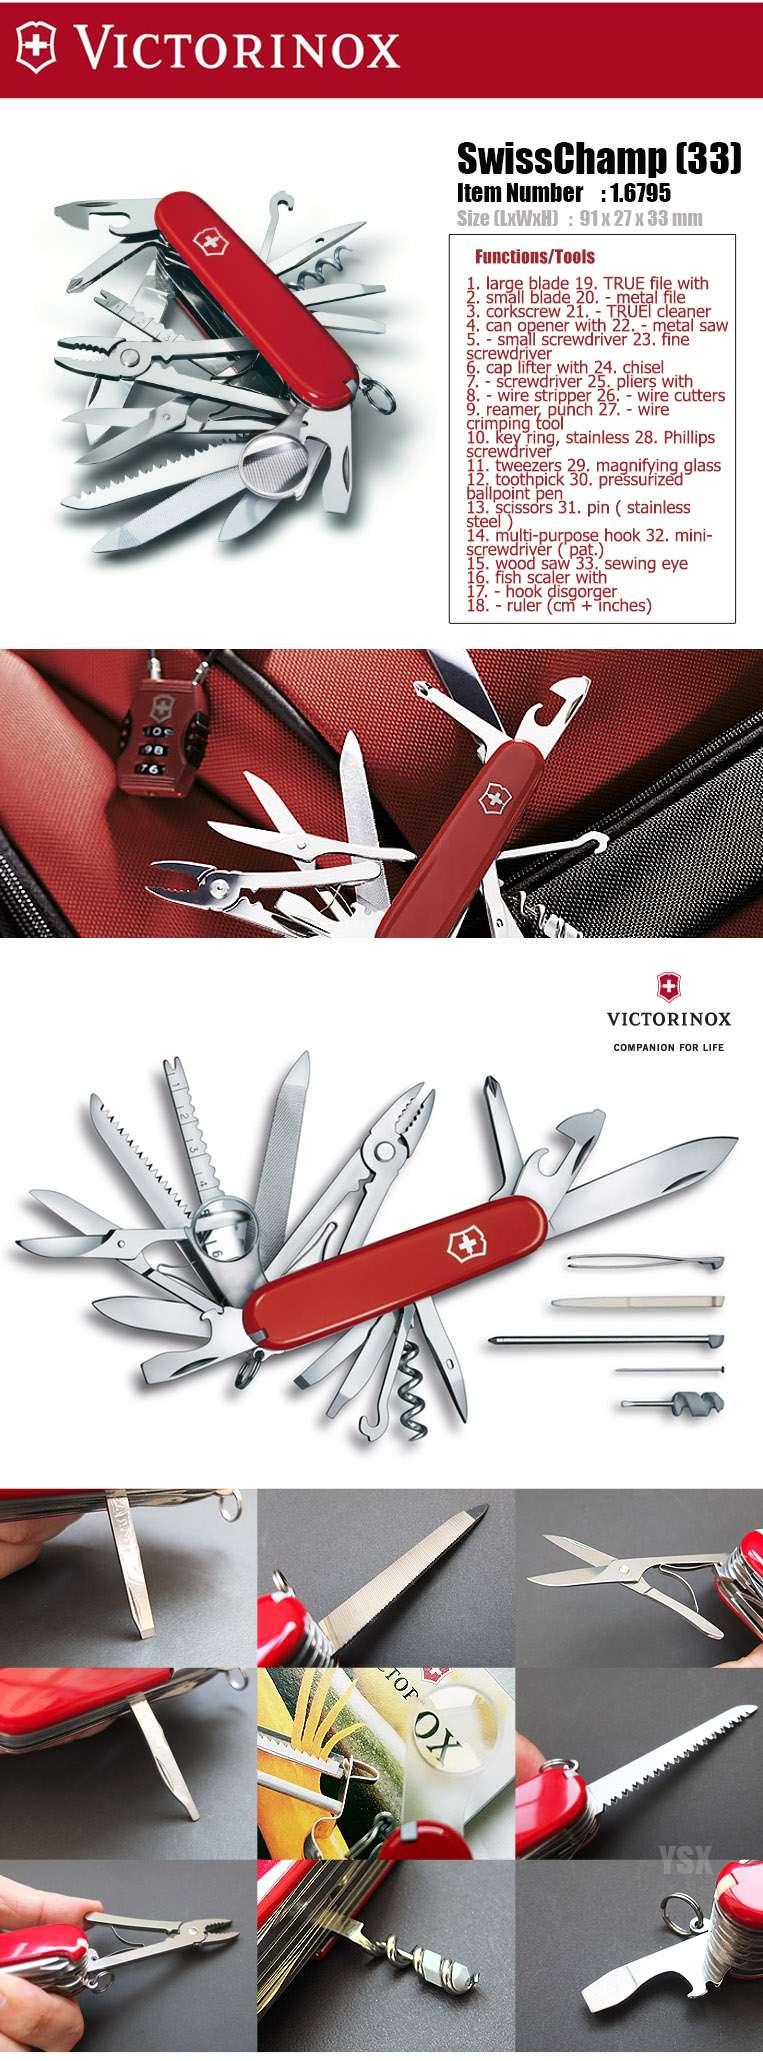 Victorinox Swiss Army Knife 91mm Red Swisschamp 33 Toolbox